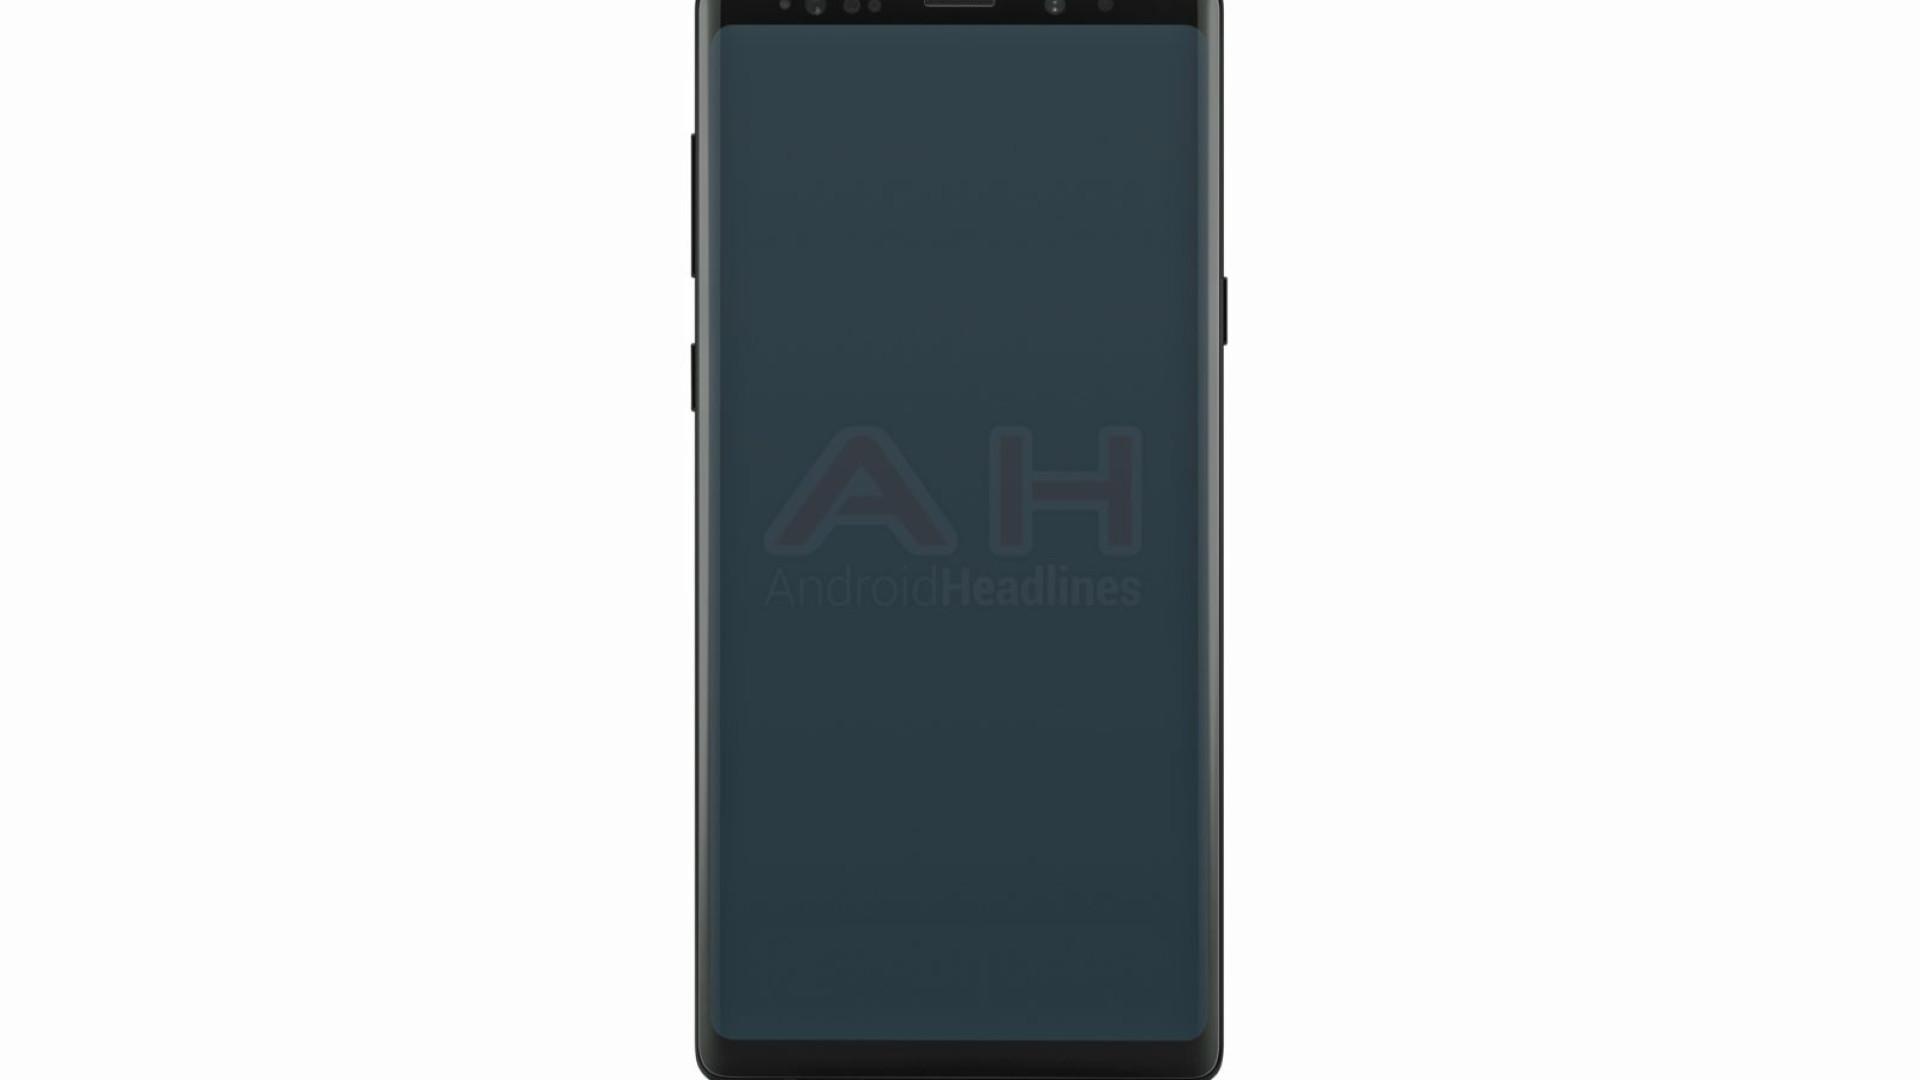 Galaxy Note 9. Esta pode ser a primeira imagem oficial